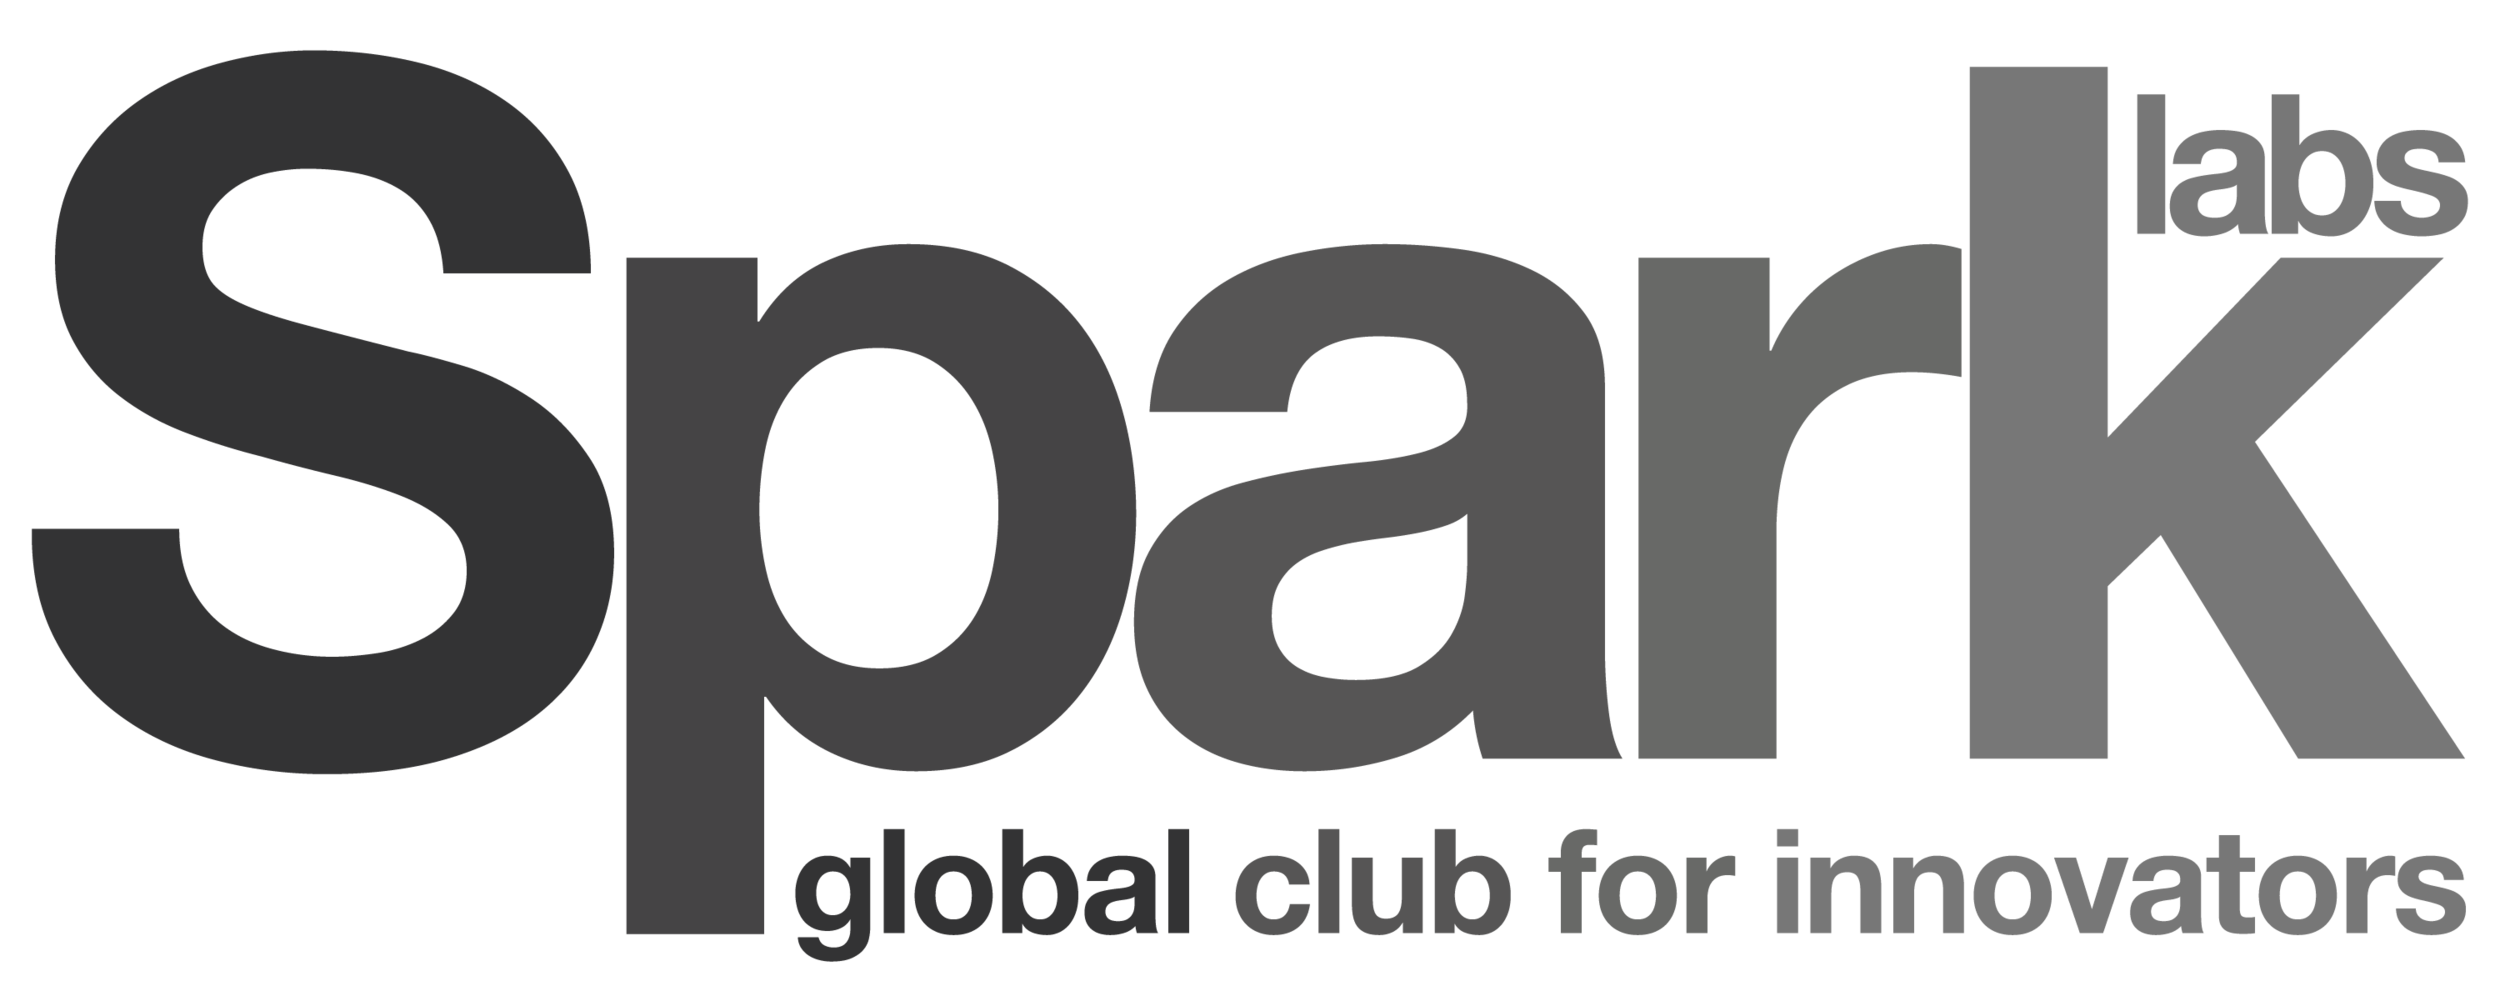 Spark_Logo_(gray_w_tagline).png